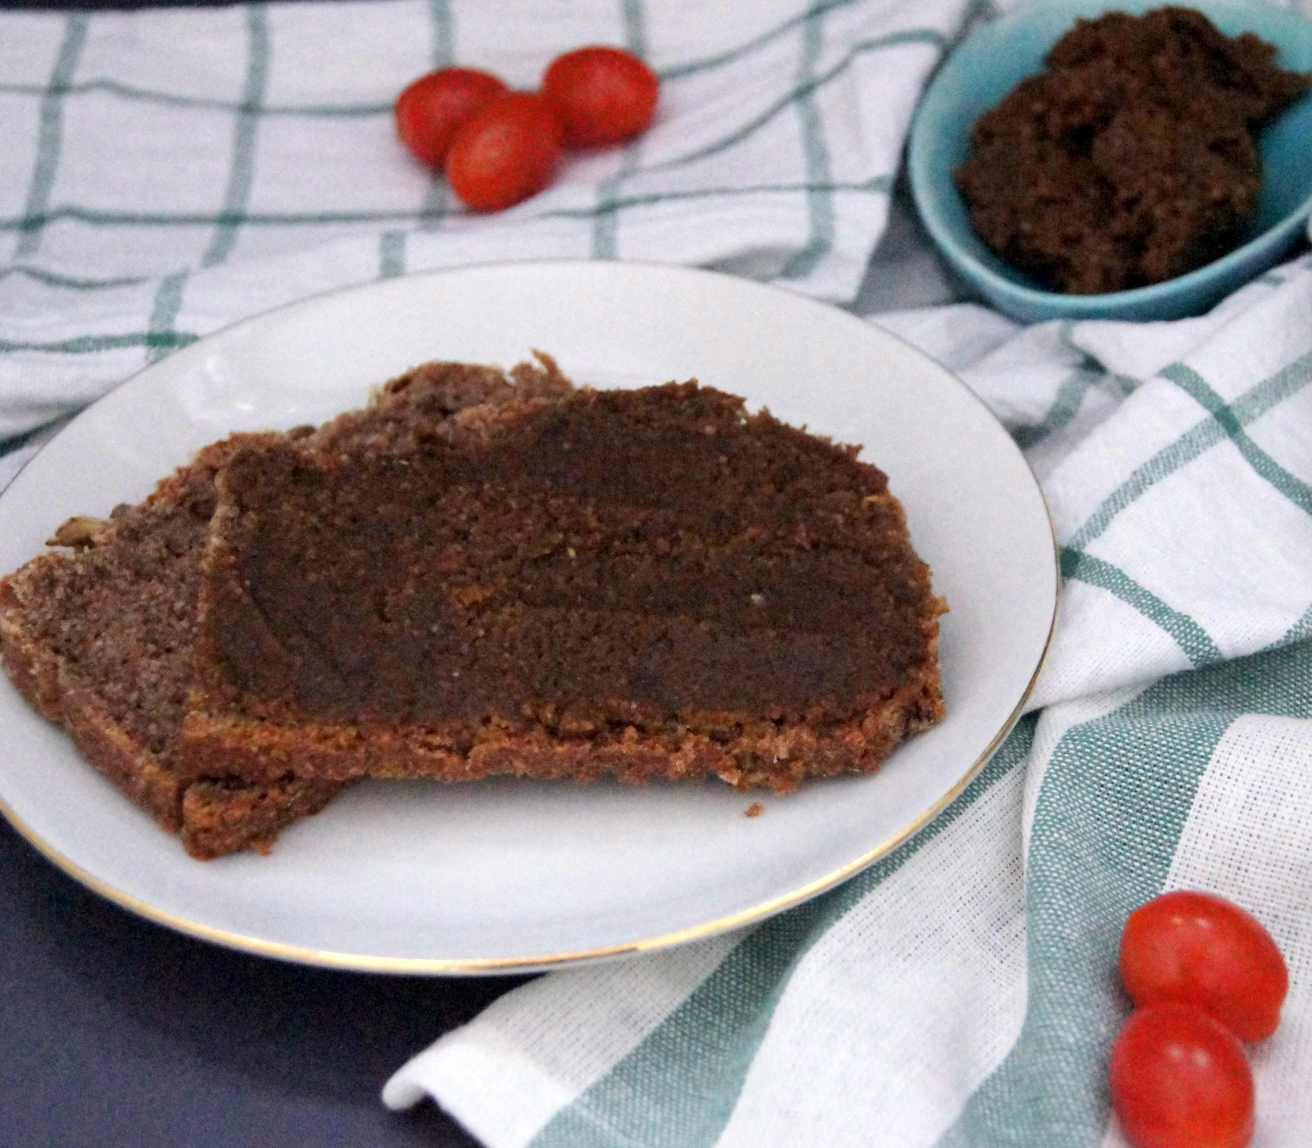 vegane Leberwurst aus Nüssen - Rezept